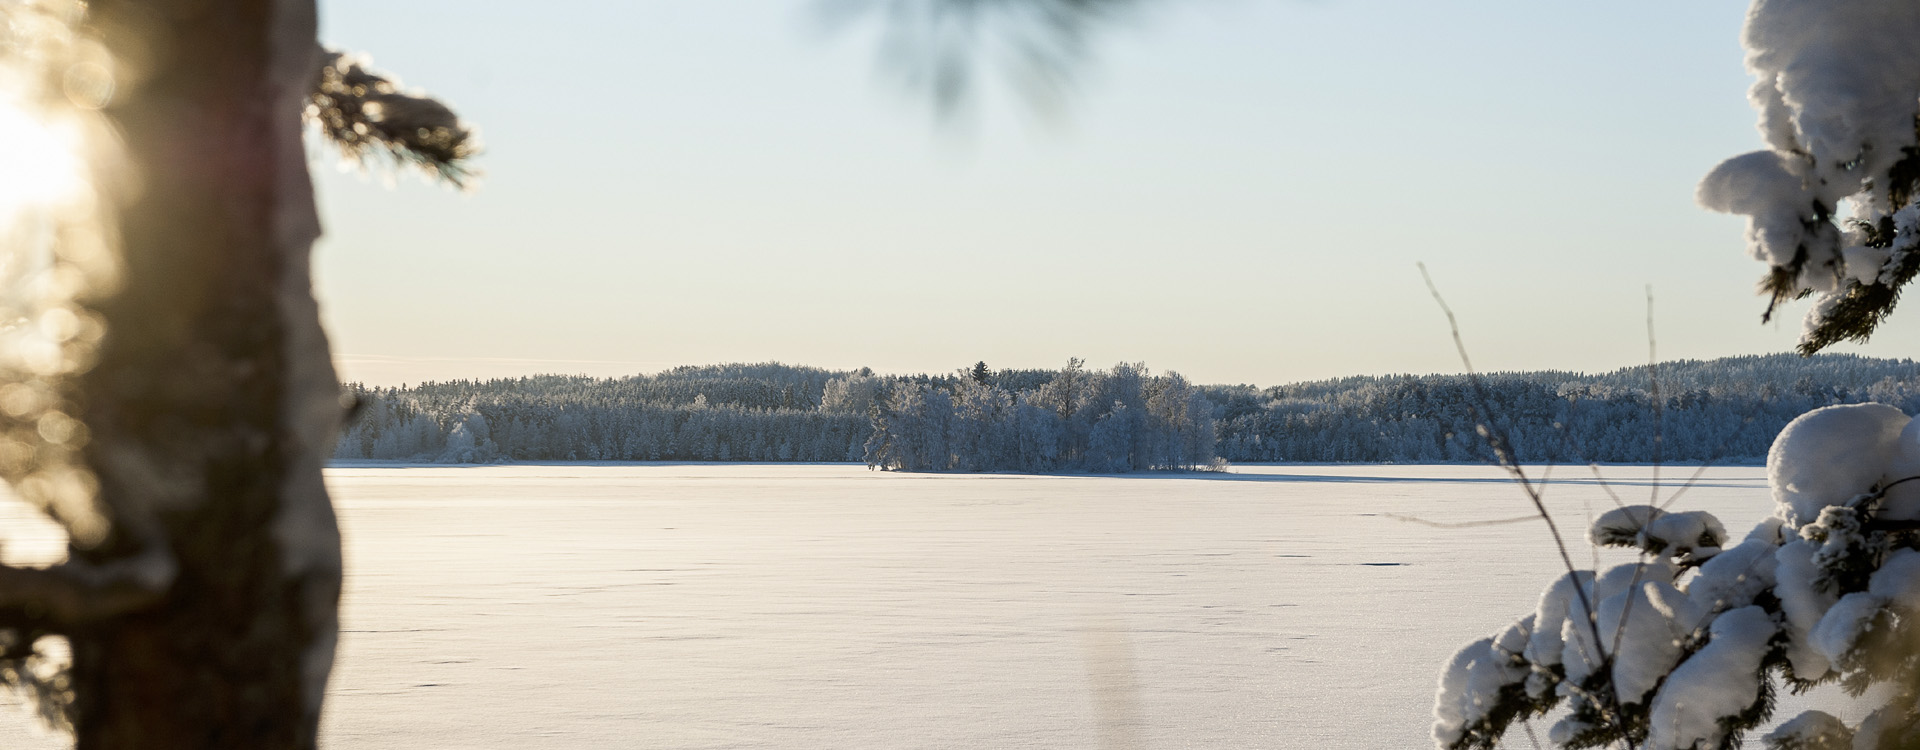 Kiteenjärvi talviasussa bf793ea3a8